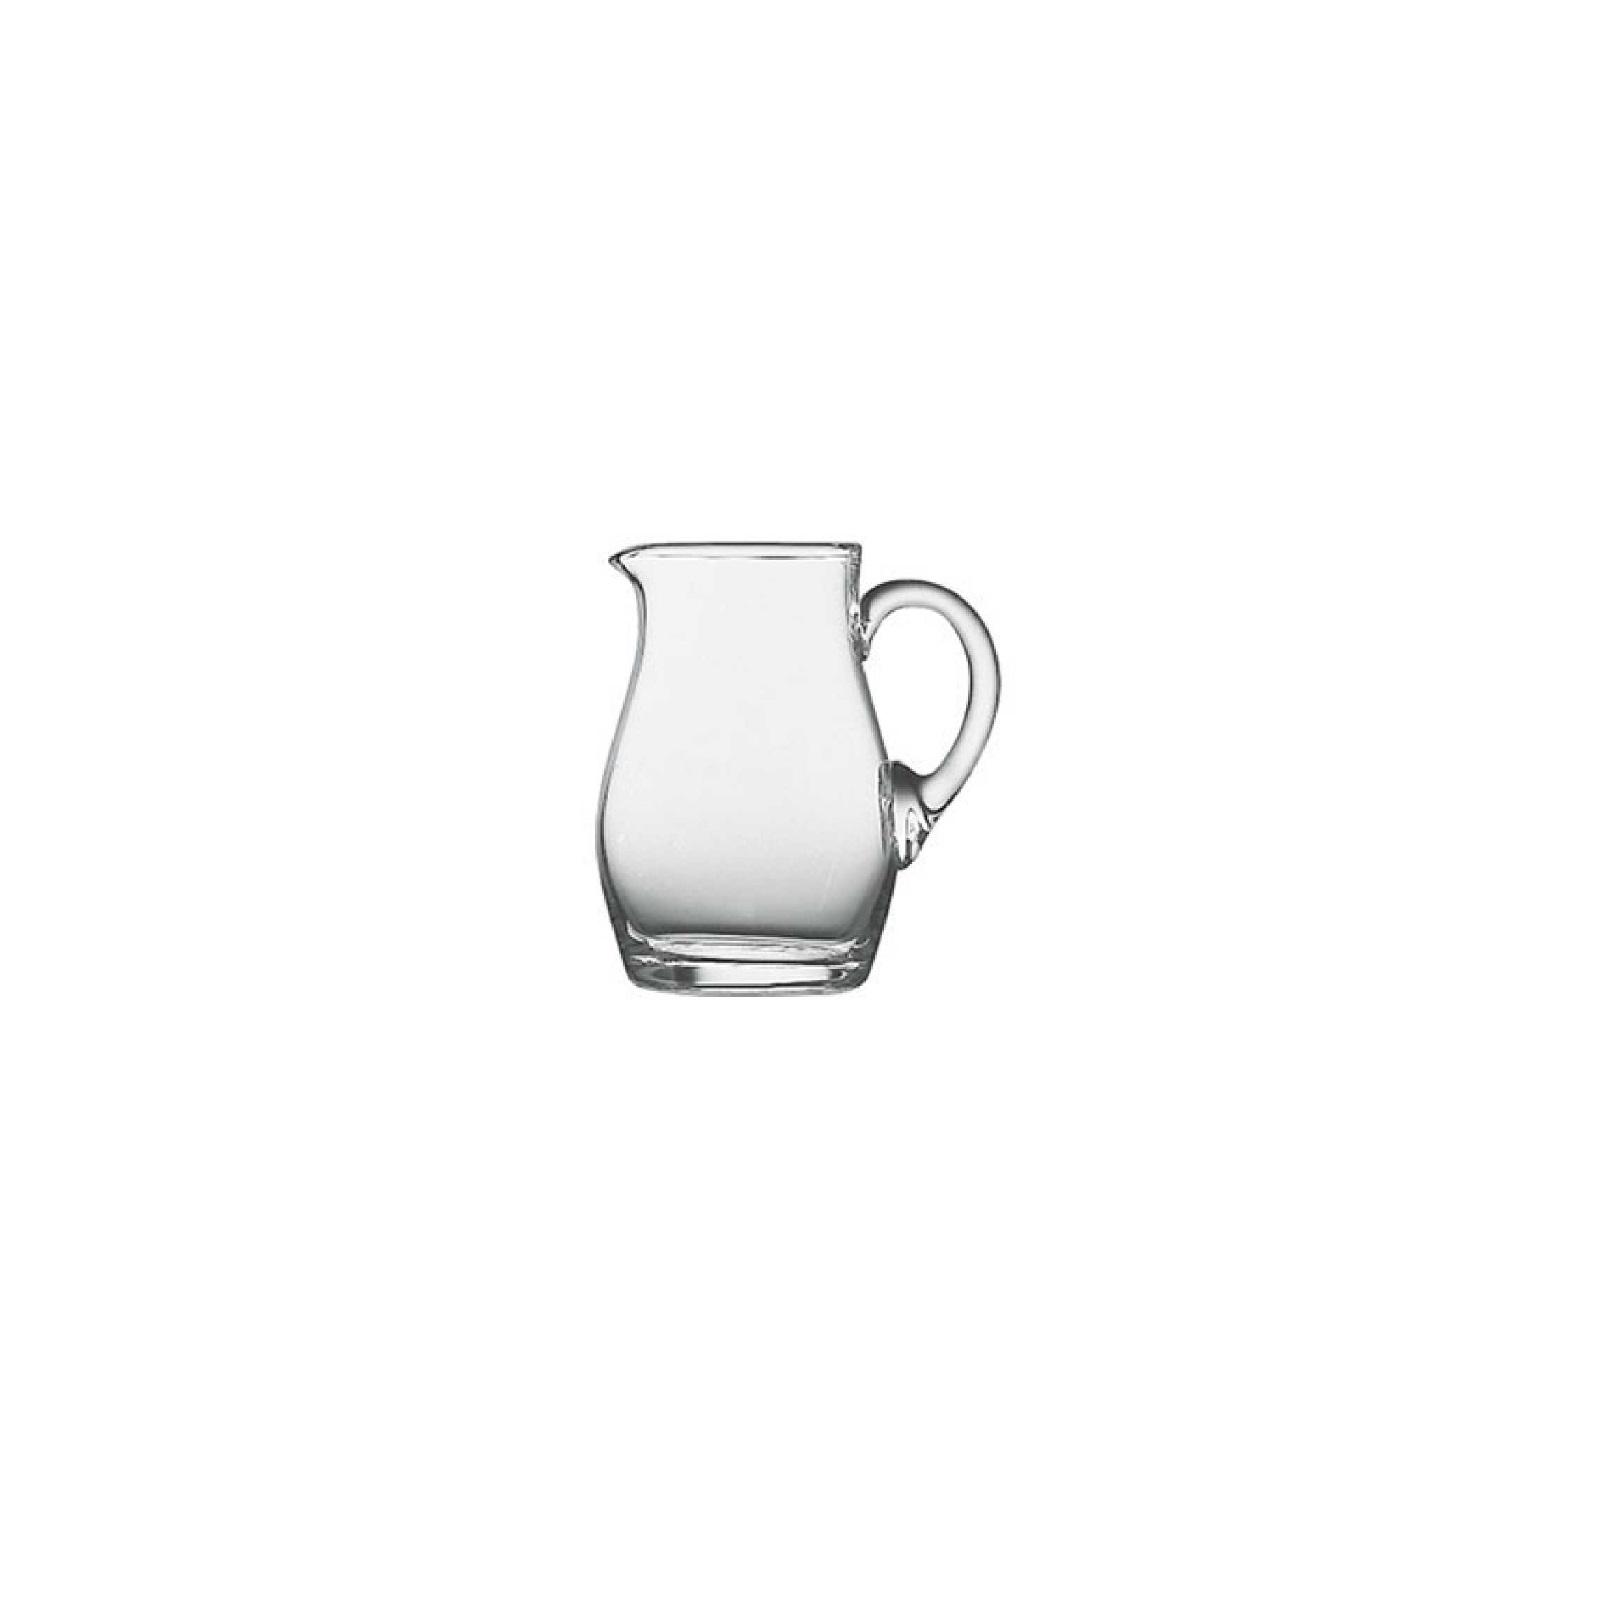 Кувшин хрустальный Schott Zwiesel BISTRO, объем 0,125 л, прозрачный Schott Zwiesel 400044 фото 1